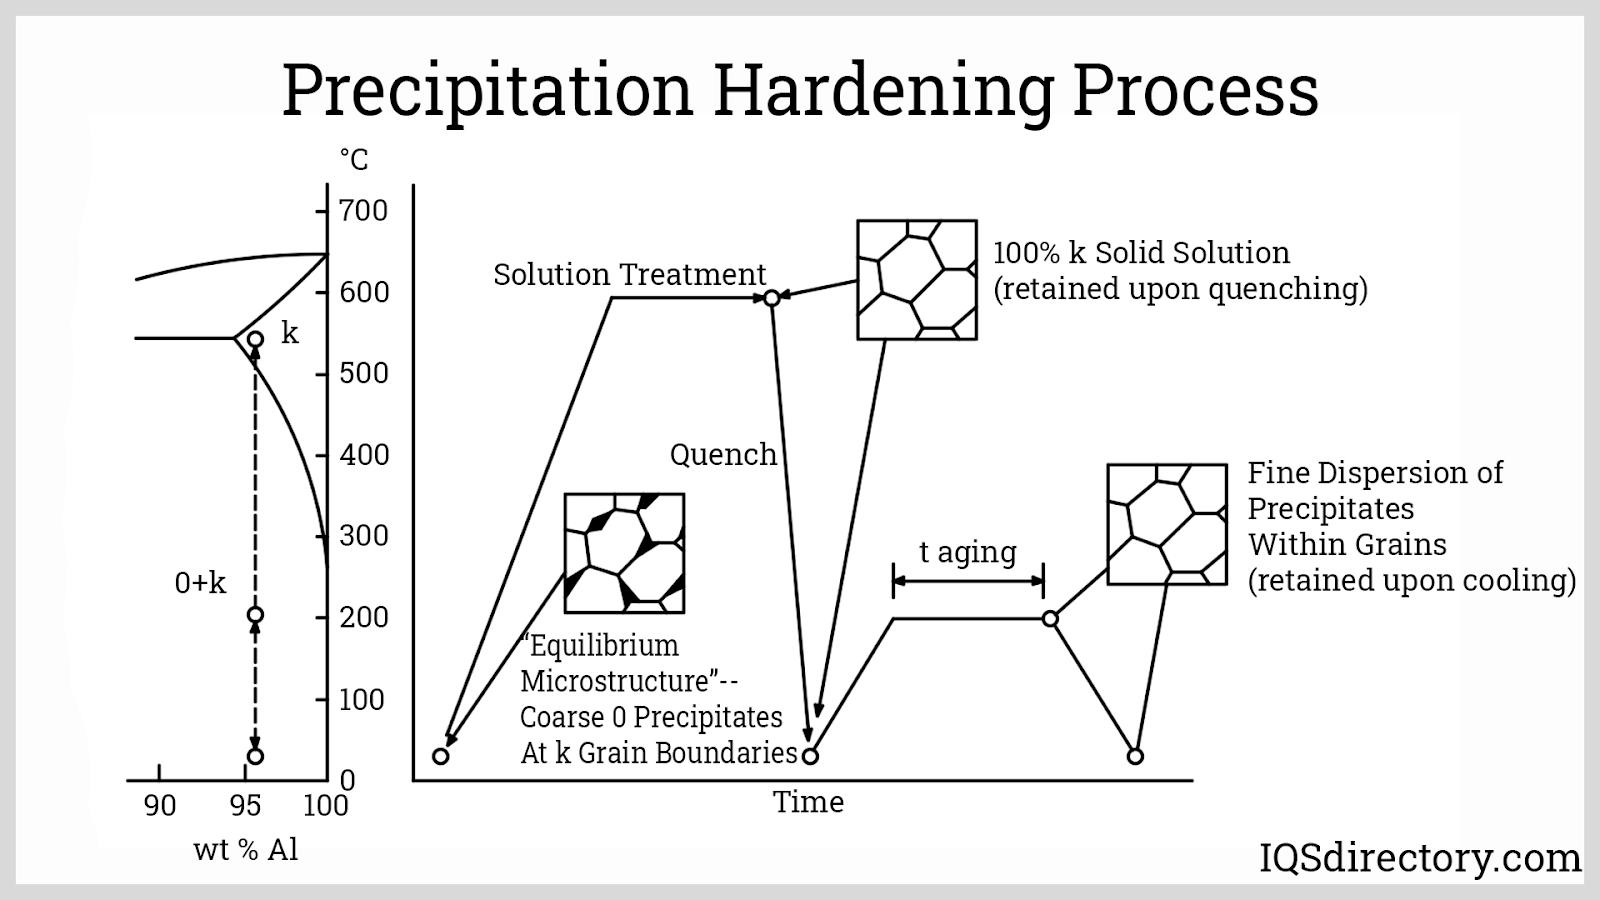 Precipitation Hardening Process